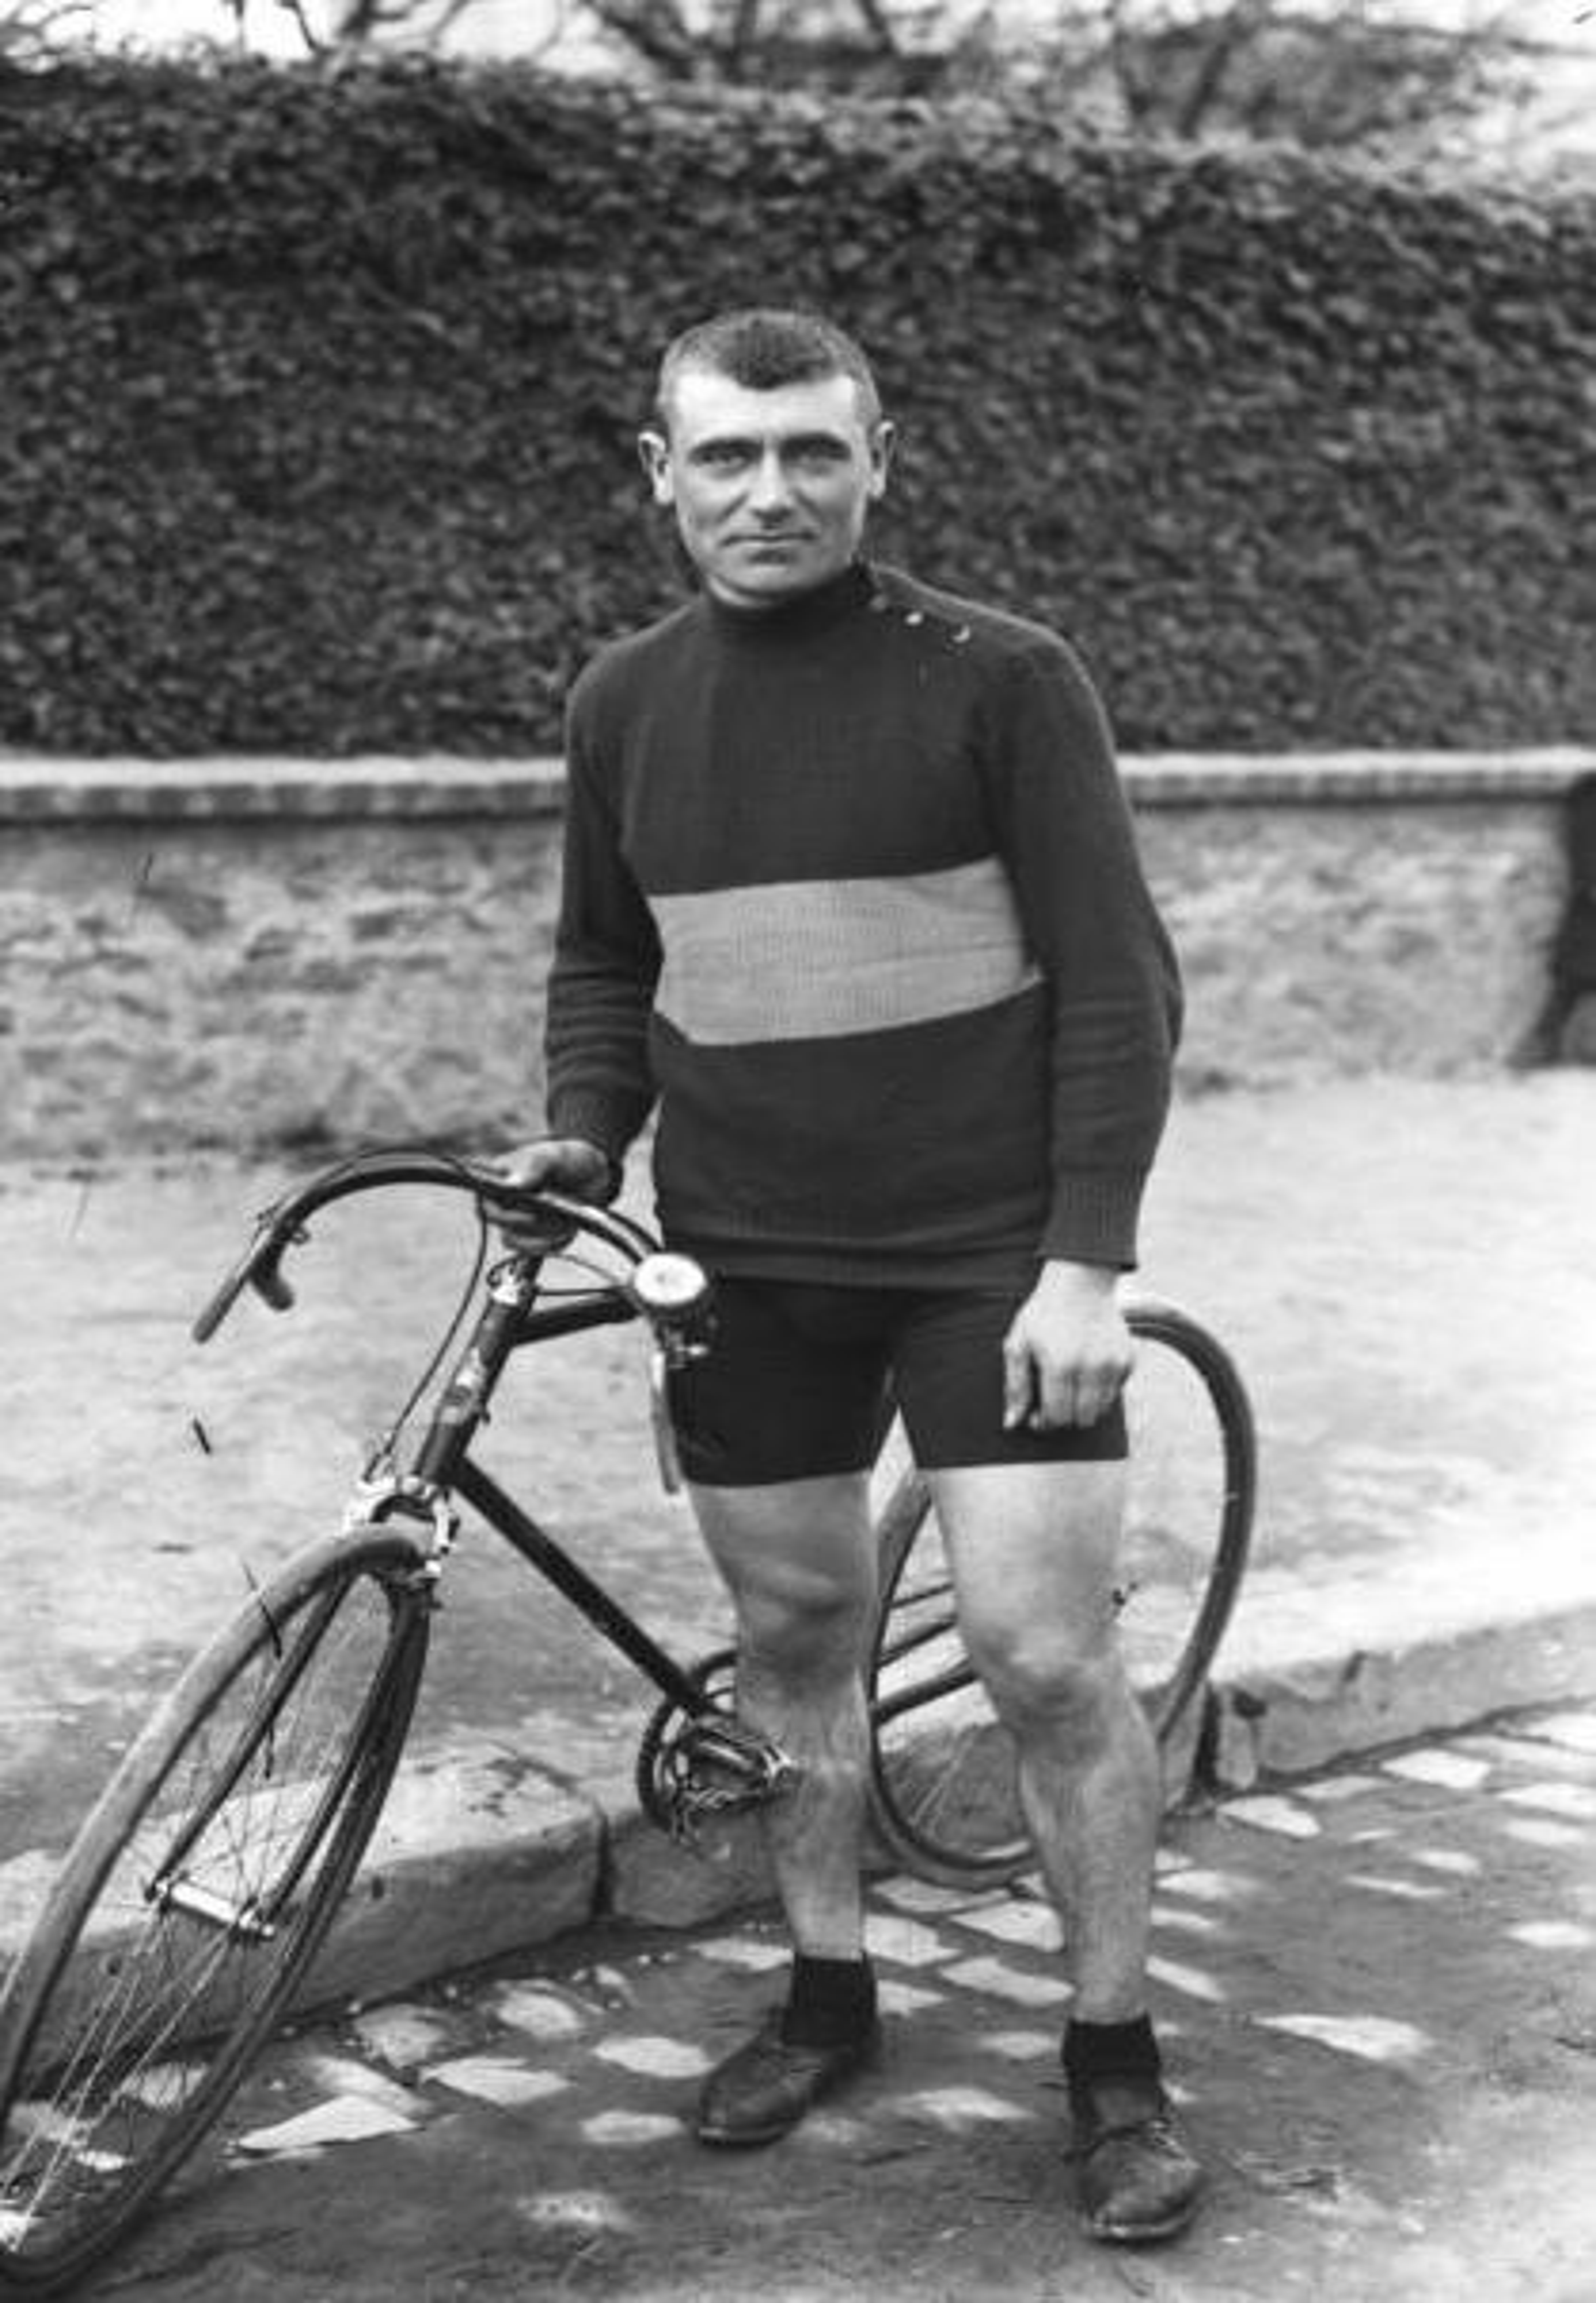 who is leading the tour de france